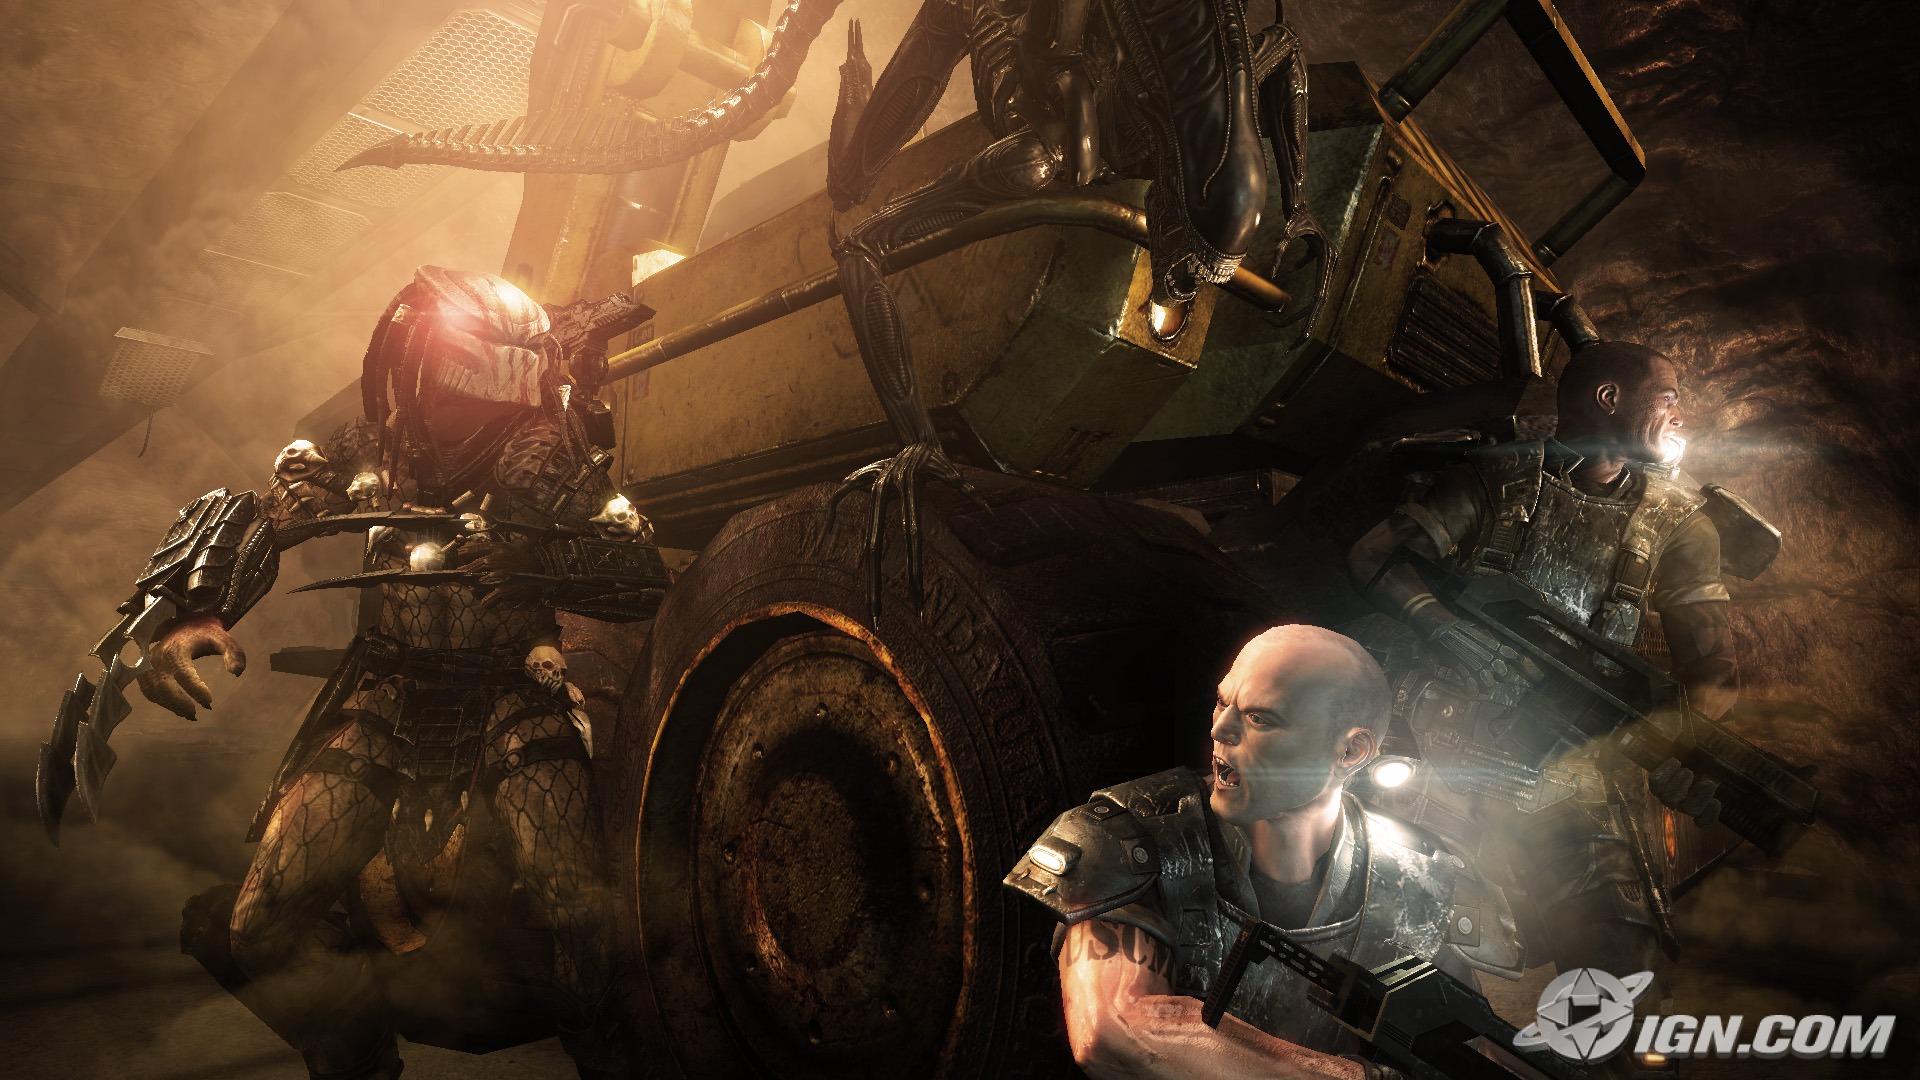 alien vs predator xbox 360 wallpaper - DriverLayer Search ...  |Alien Vs Predator Xbox 360 Wallpaper